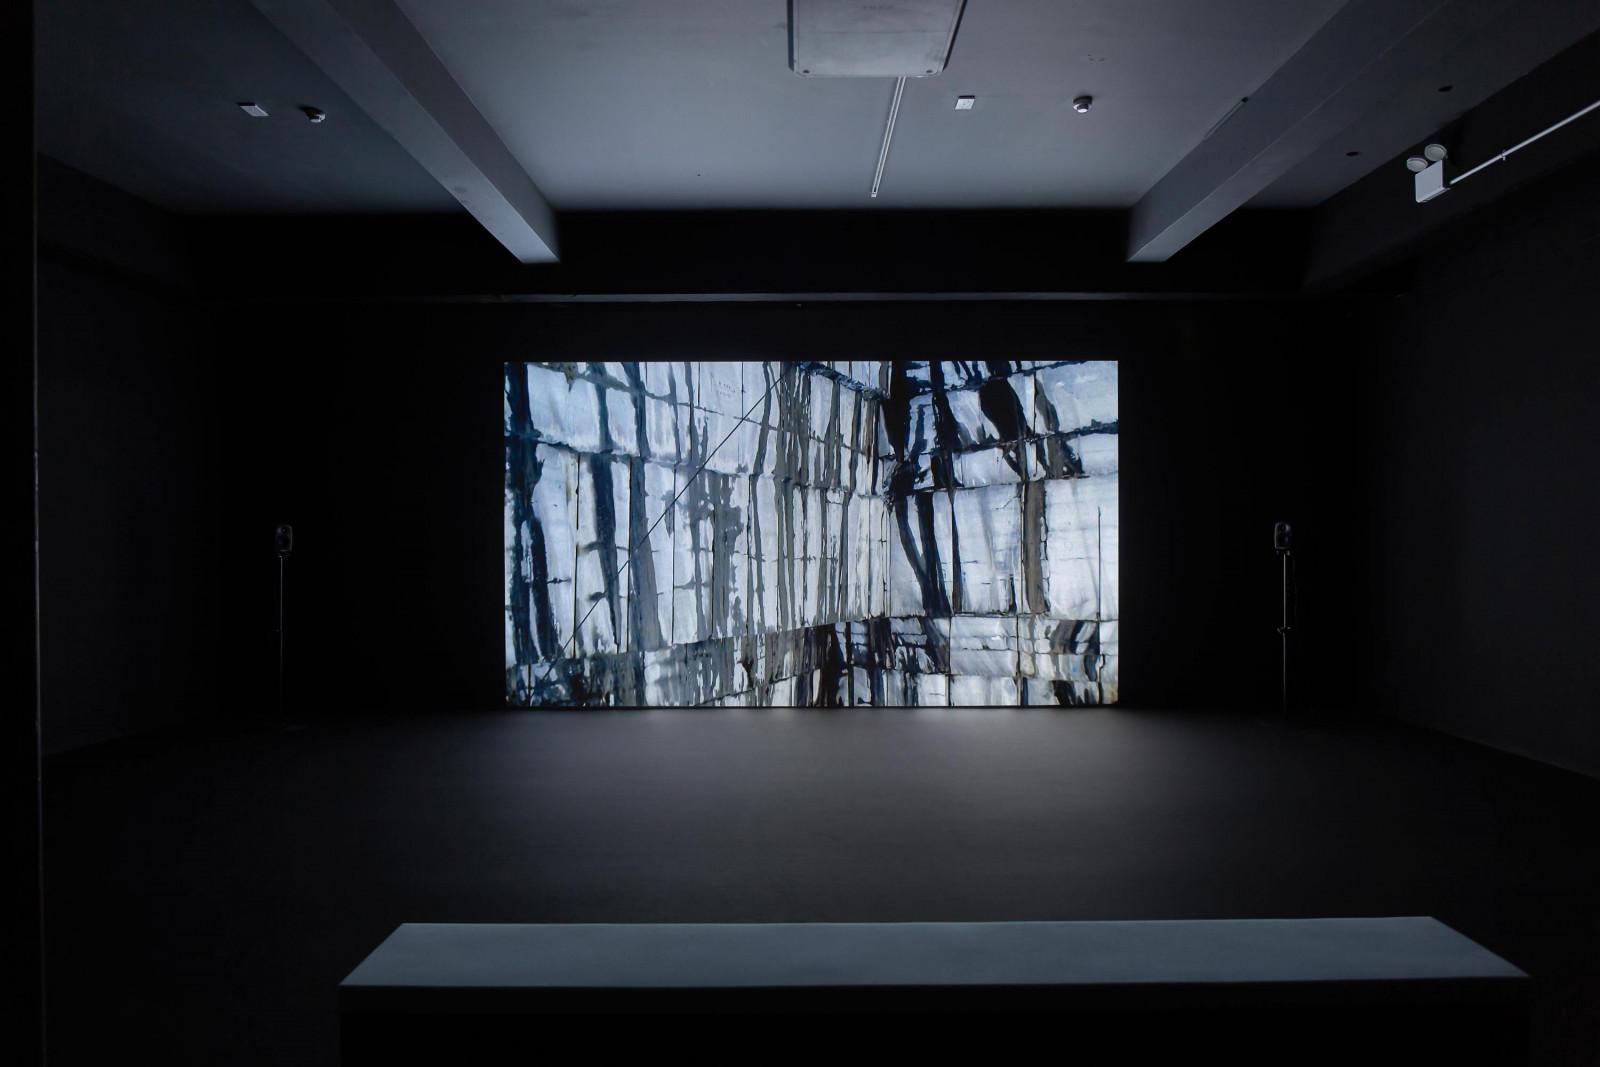 Exhibition view, Temple Bar Gallery, 2018/19. Photo: Kasia Kaminska